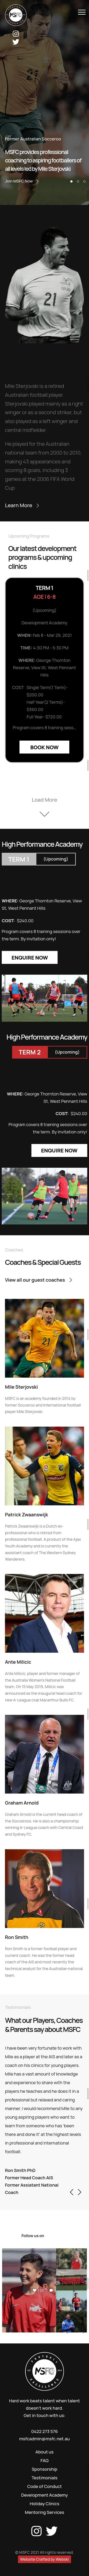 soccer-football-web-design